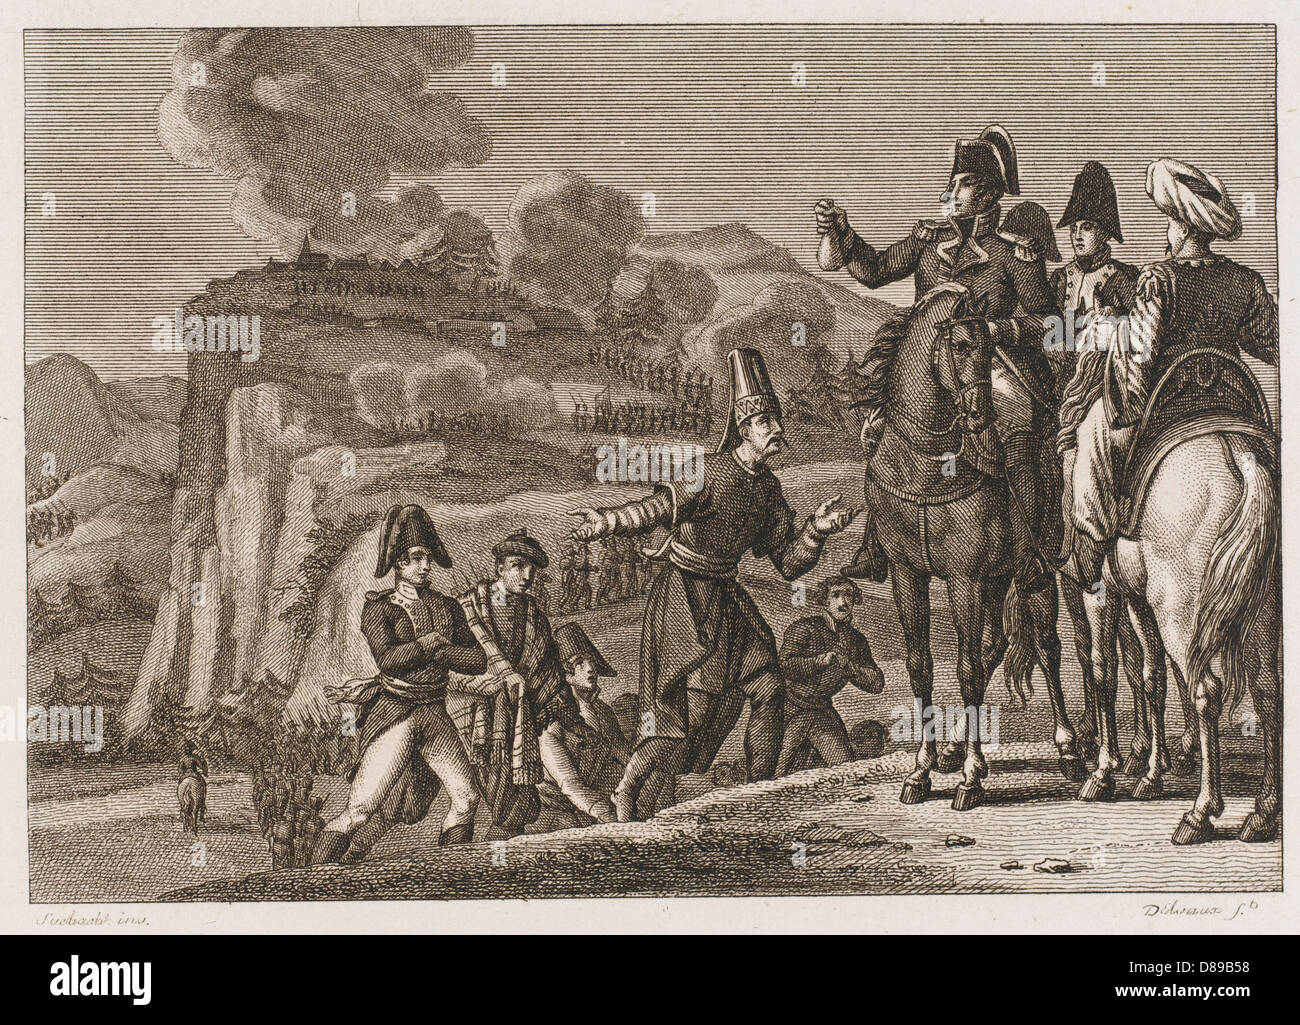 De Launay Herzegovina - Stock Image